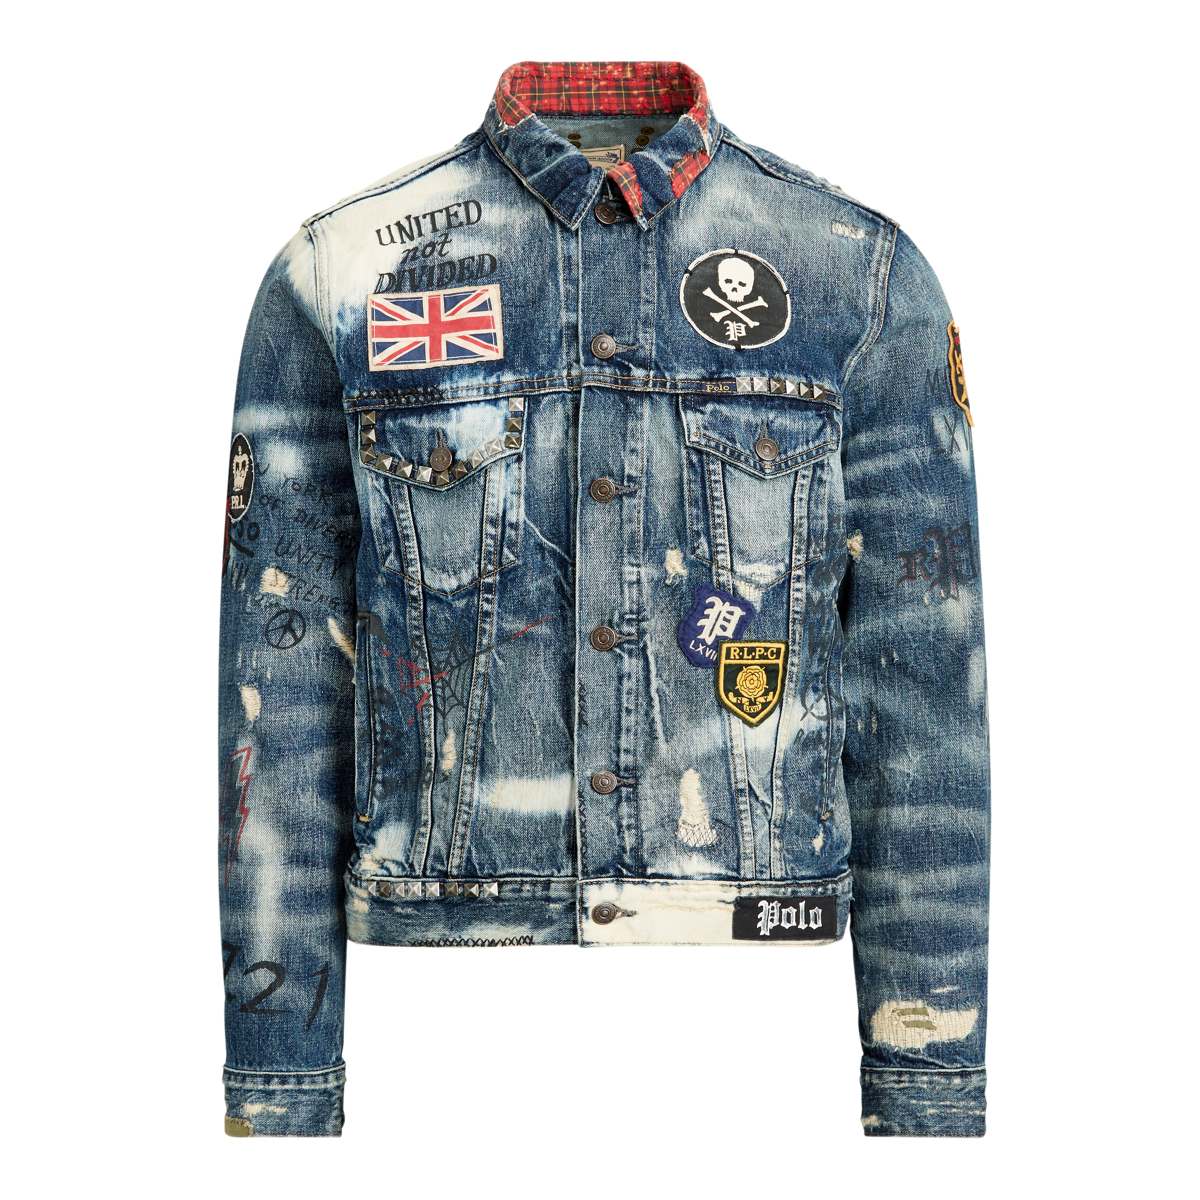 Pin By Samuel Madera On Jacket Levis Vintage Clothing Trucker Jacket Jackets [ 1200 x 1200 Pixel ]